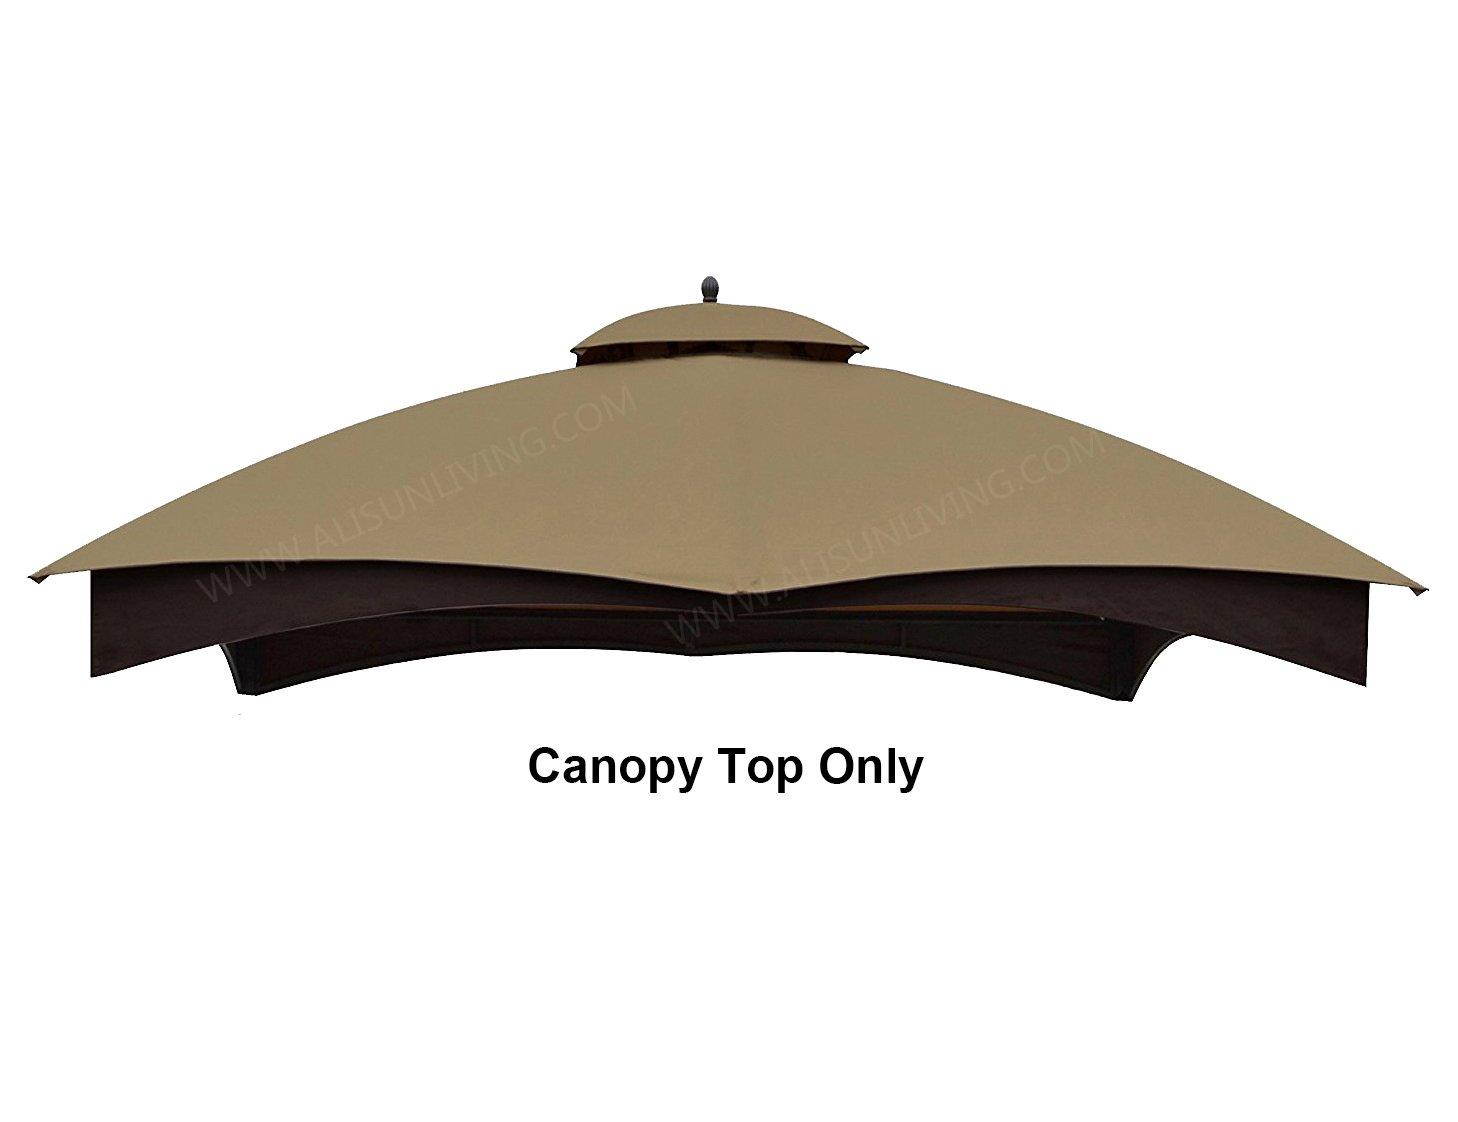 ALISUN Replacement Canopy Top for Lowe's 10' x 12' Gazebo #TPGAZ17-002C